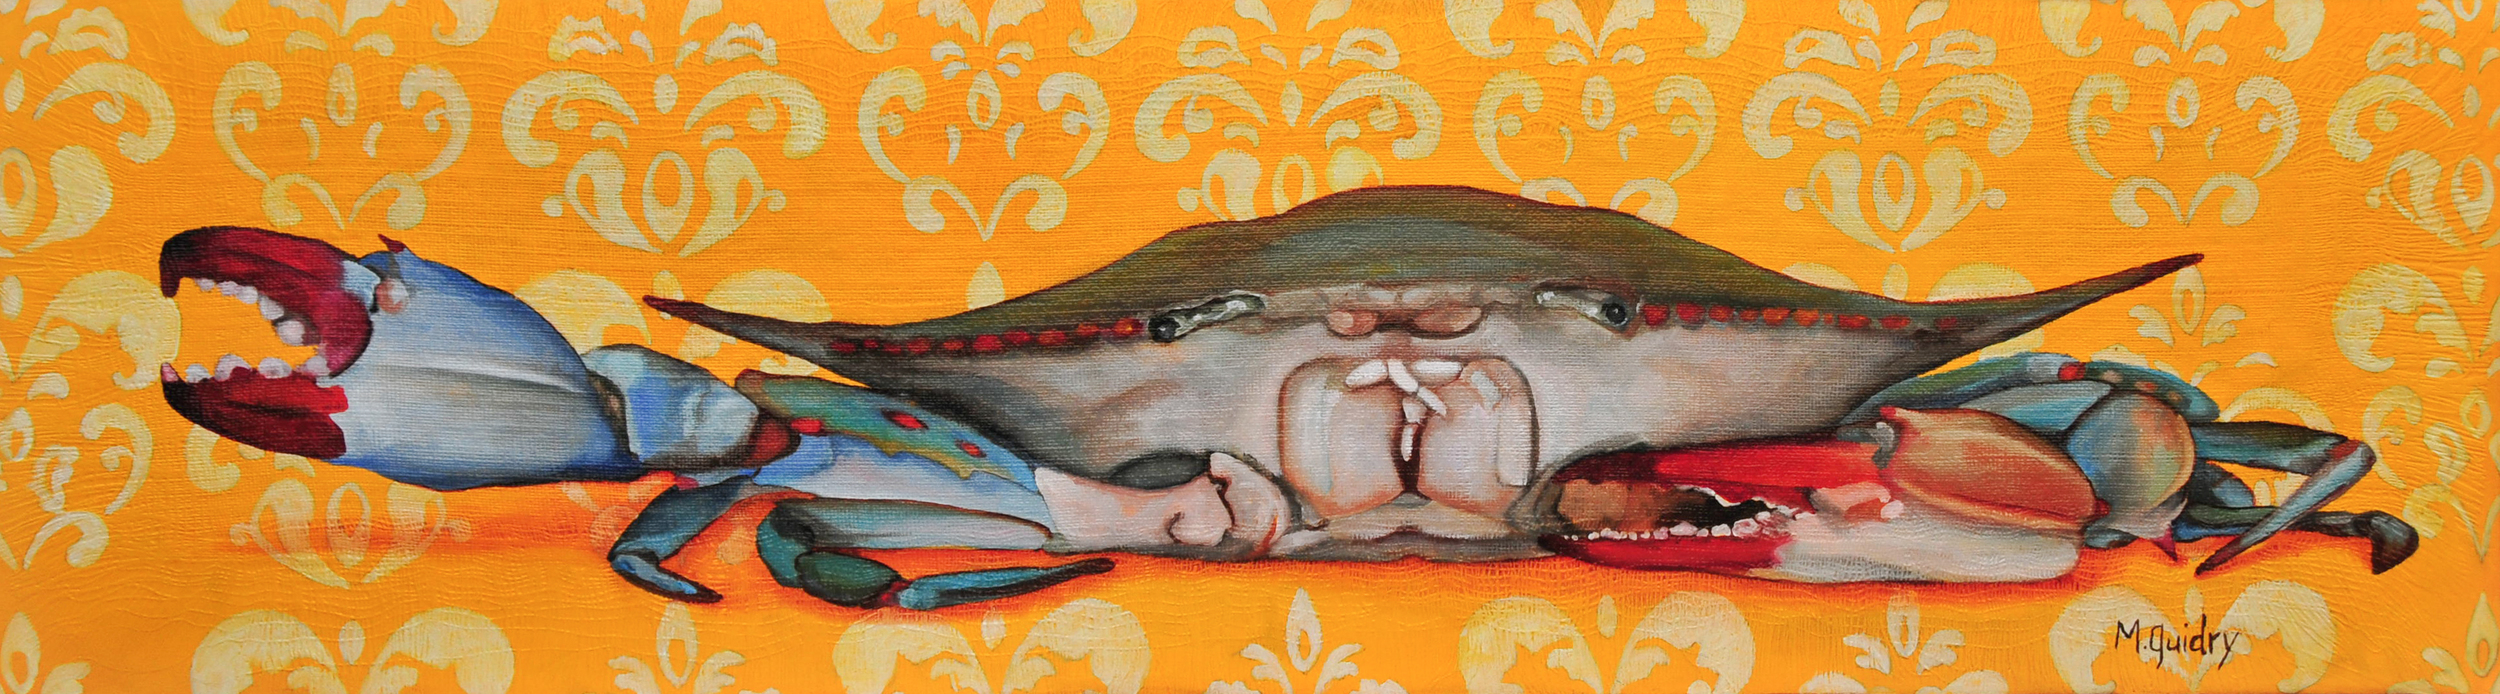 blue_crab_louisiana_m.guidry_michael_guidry_oil_painting_marsh_new_orleans_artist.jpg-2.jpg